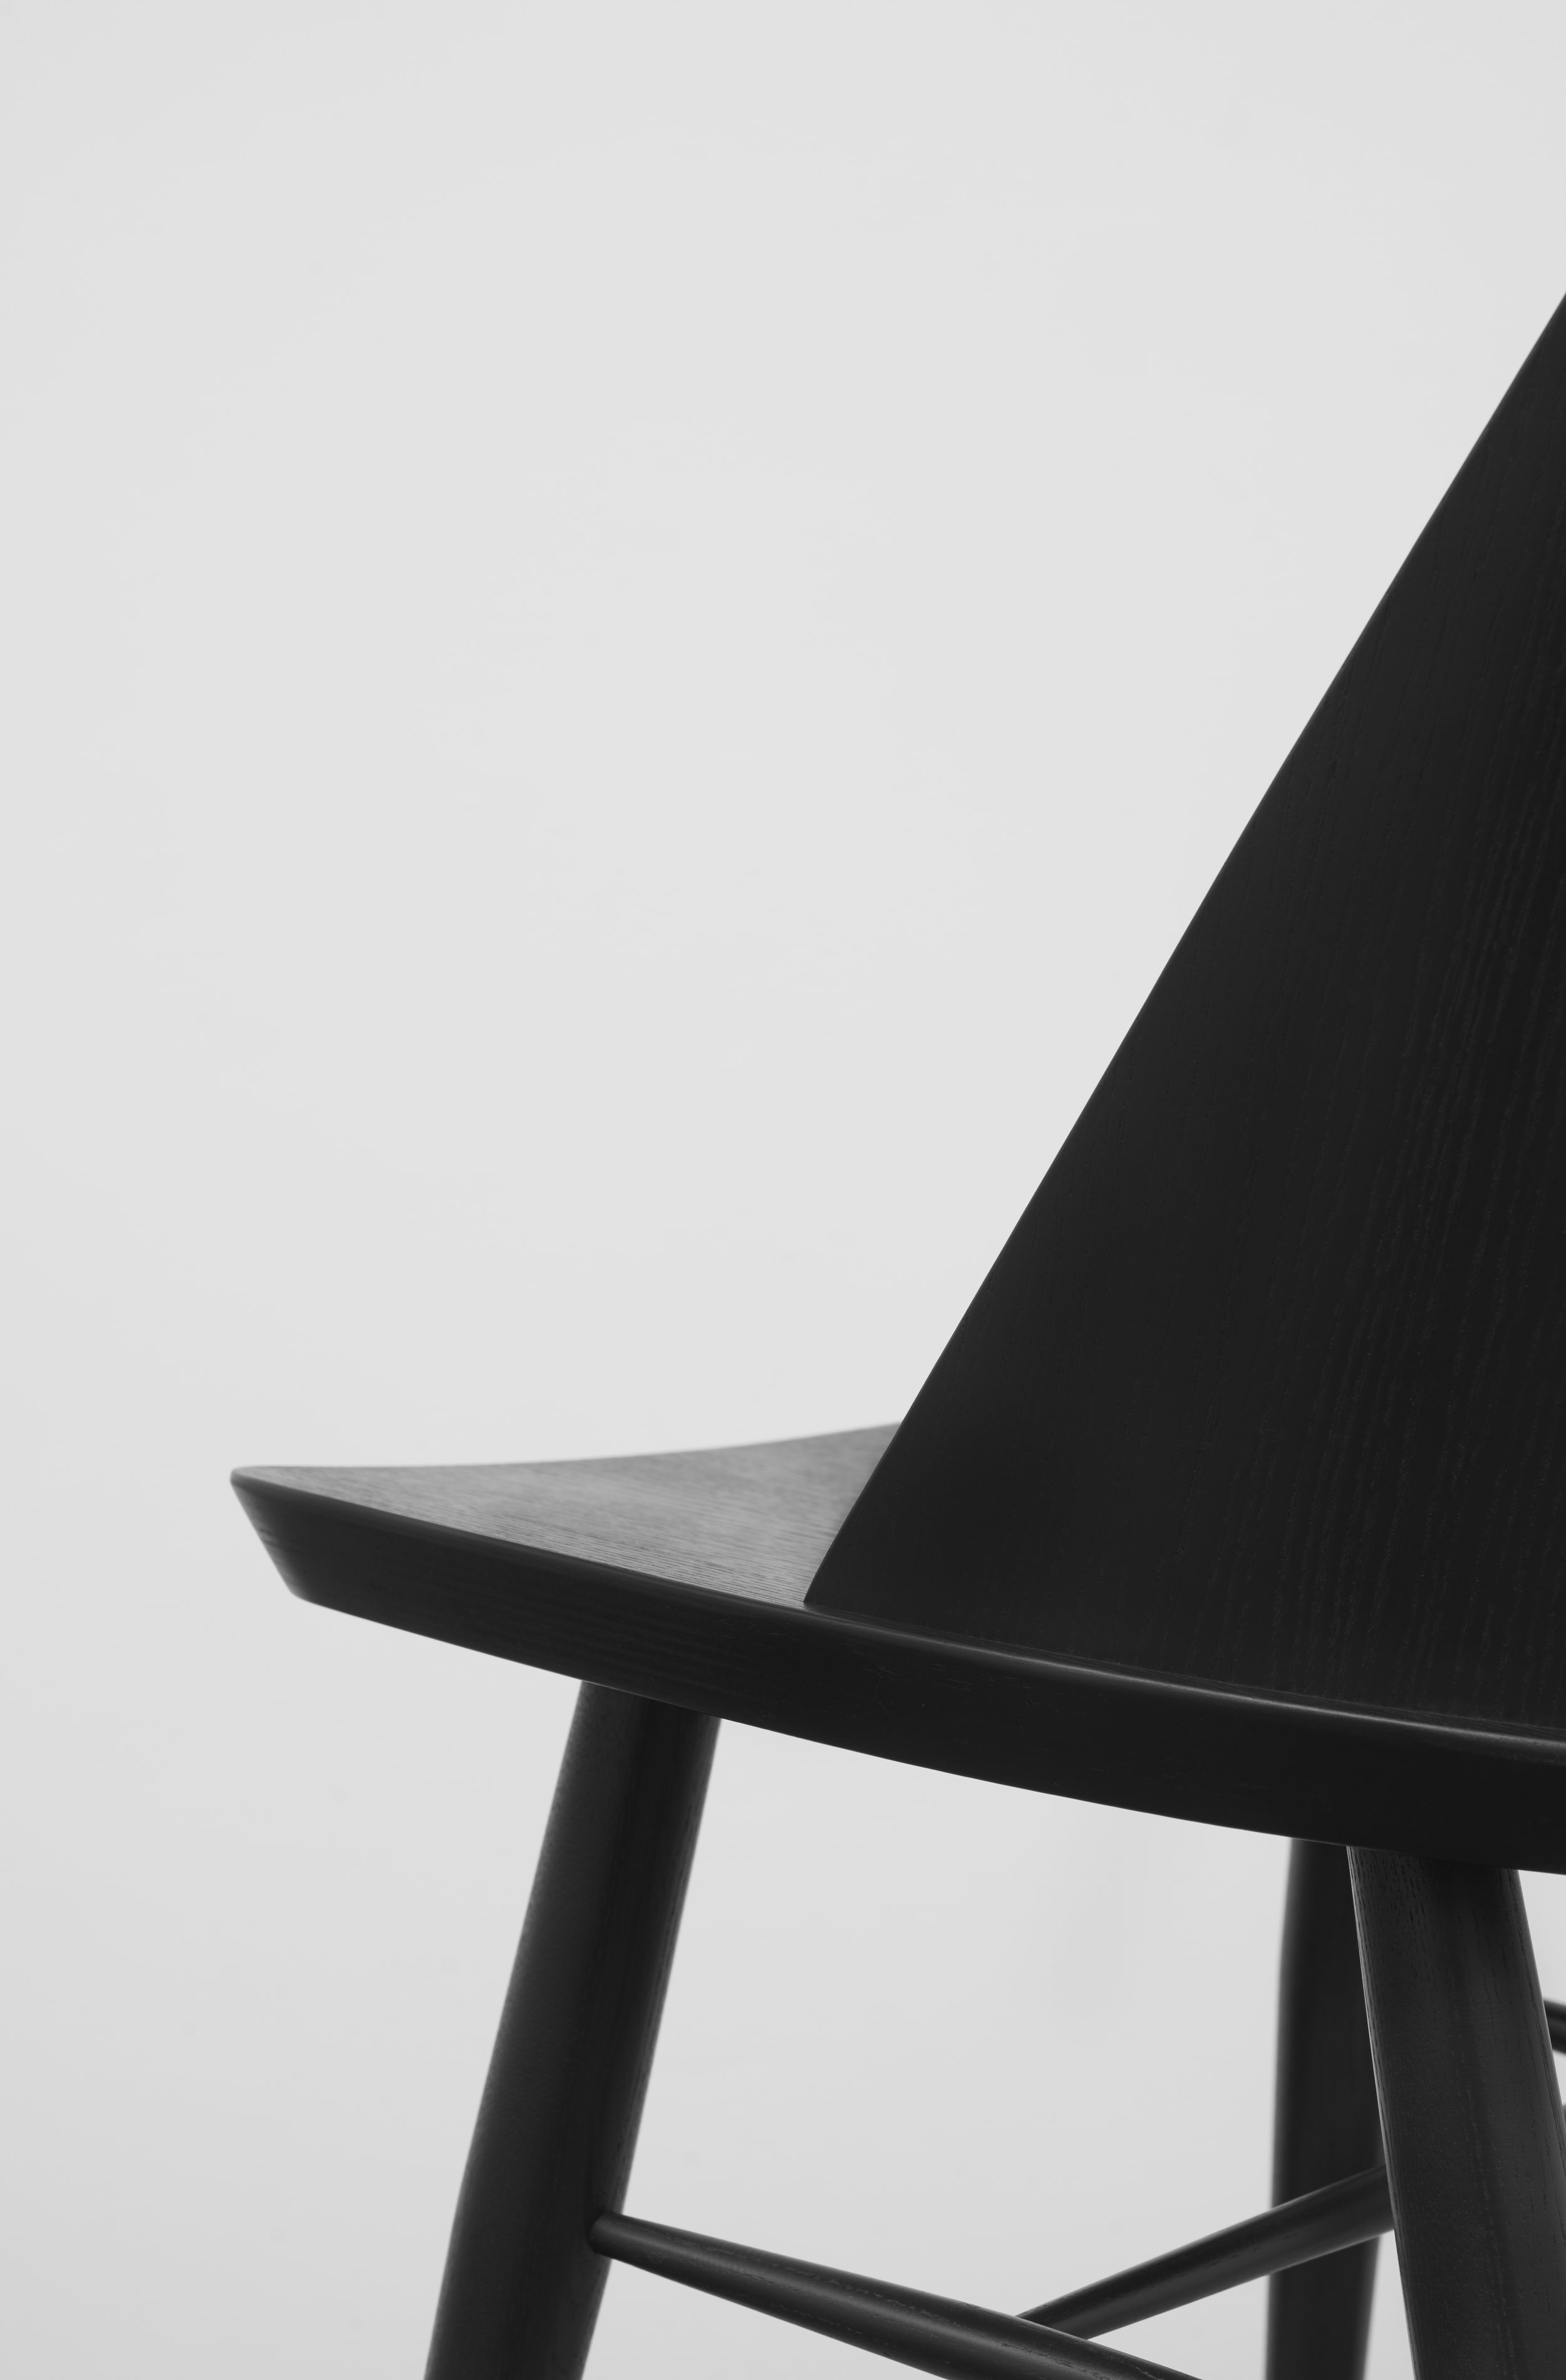 synnes-chair-2015-falke-svatun(8)